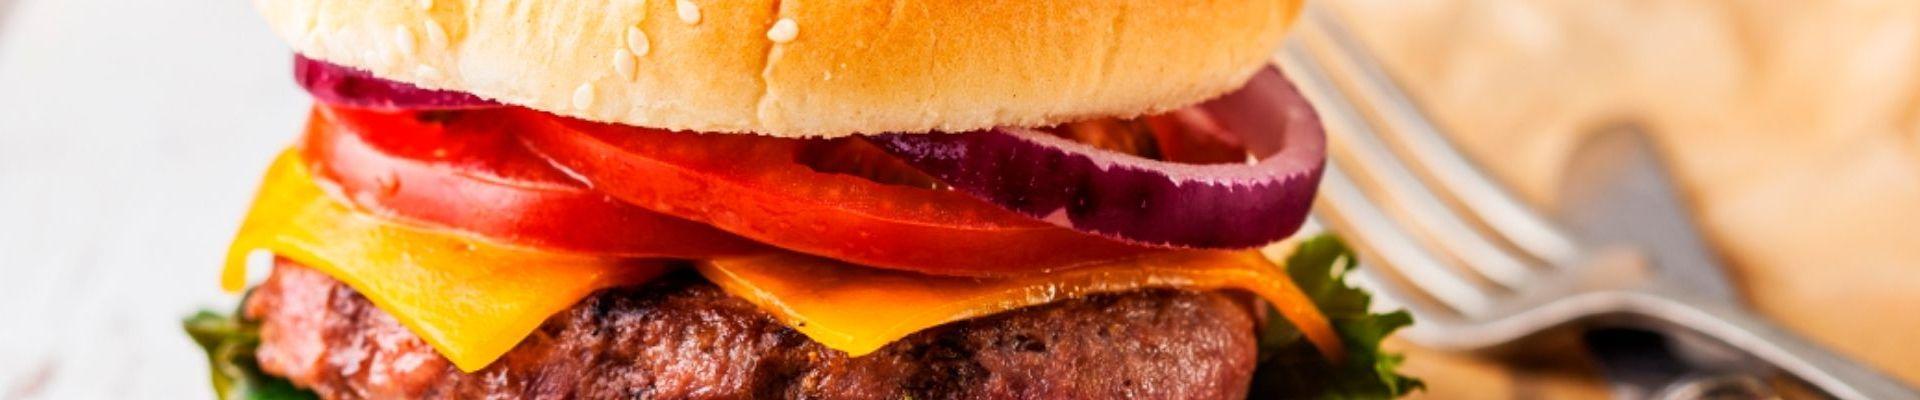 Las mejores hamburguesas a domicilio en Chueca